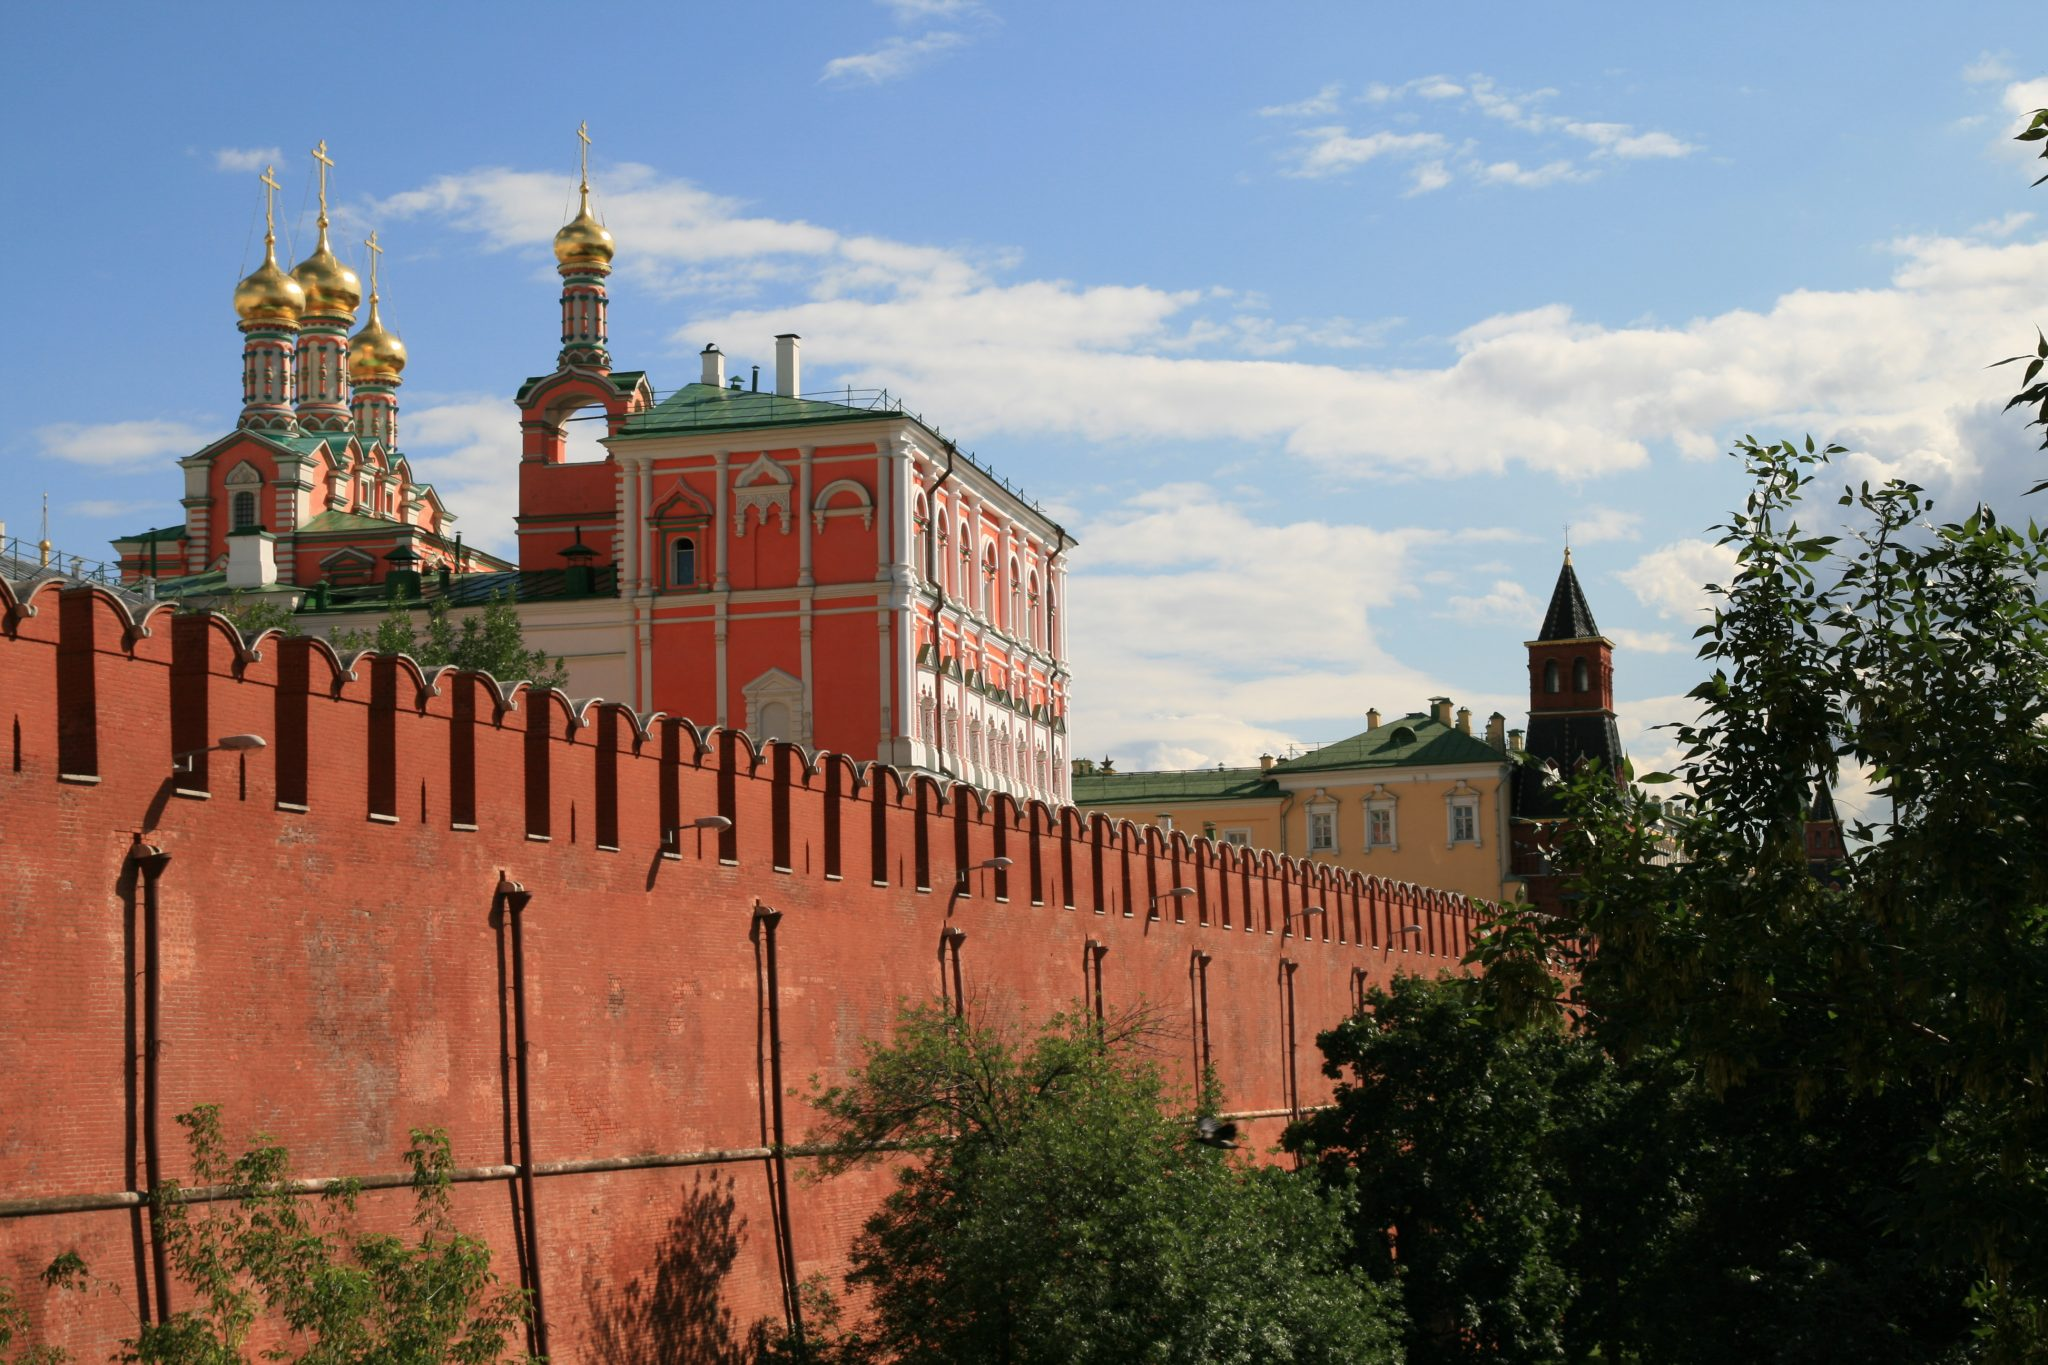 Mury Kremla fot. Bernt Rostad / Flickr